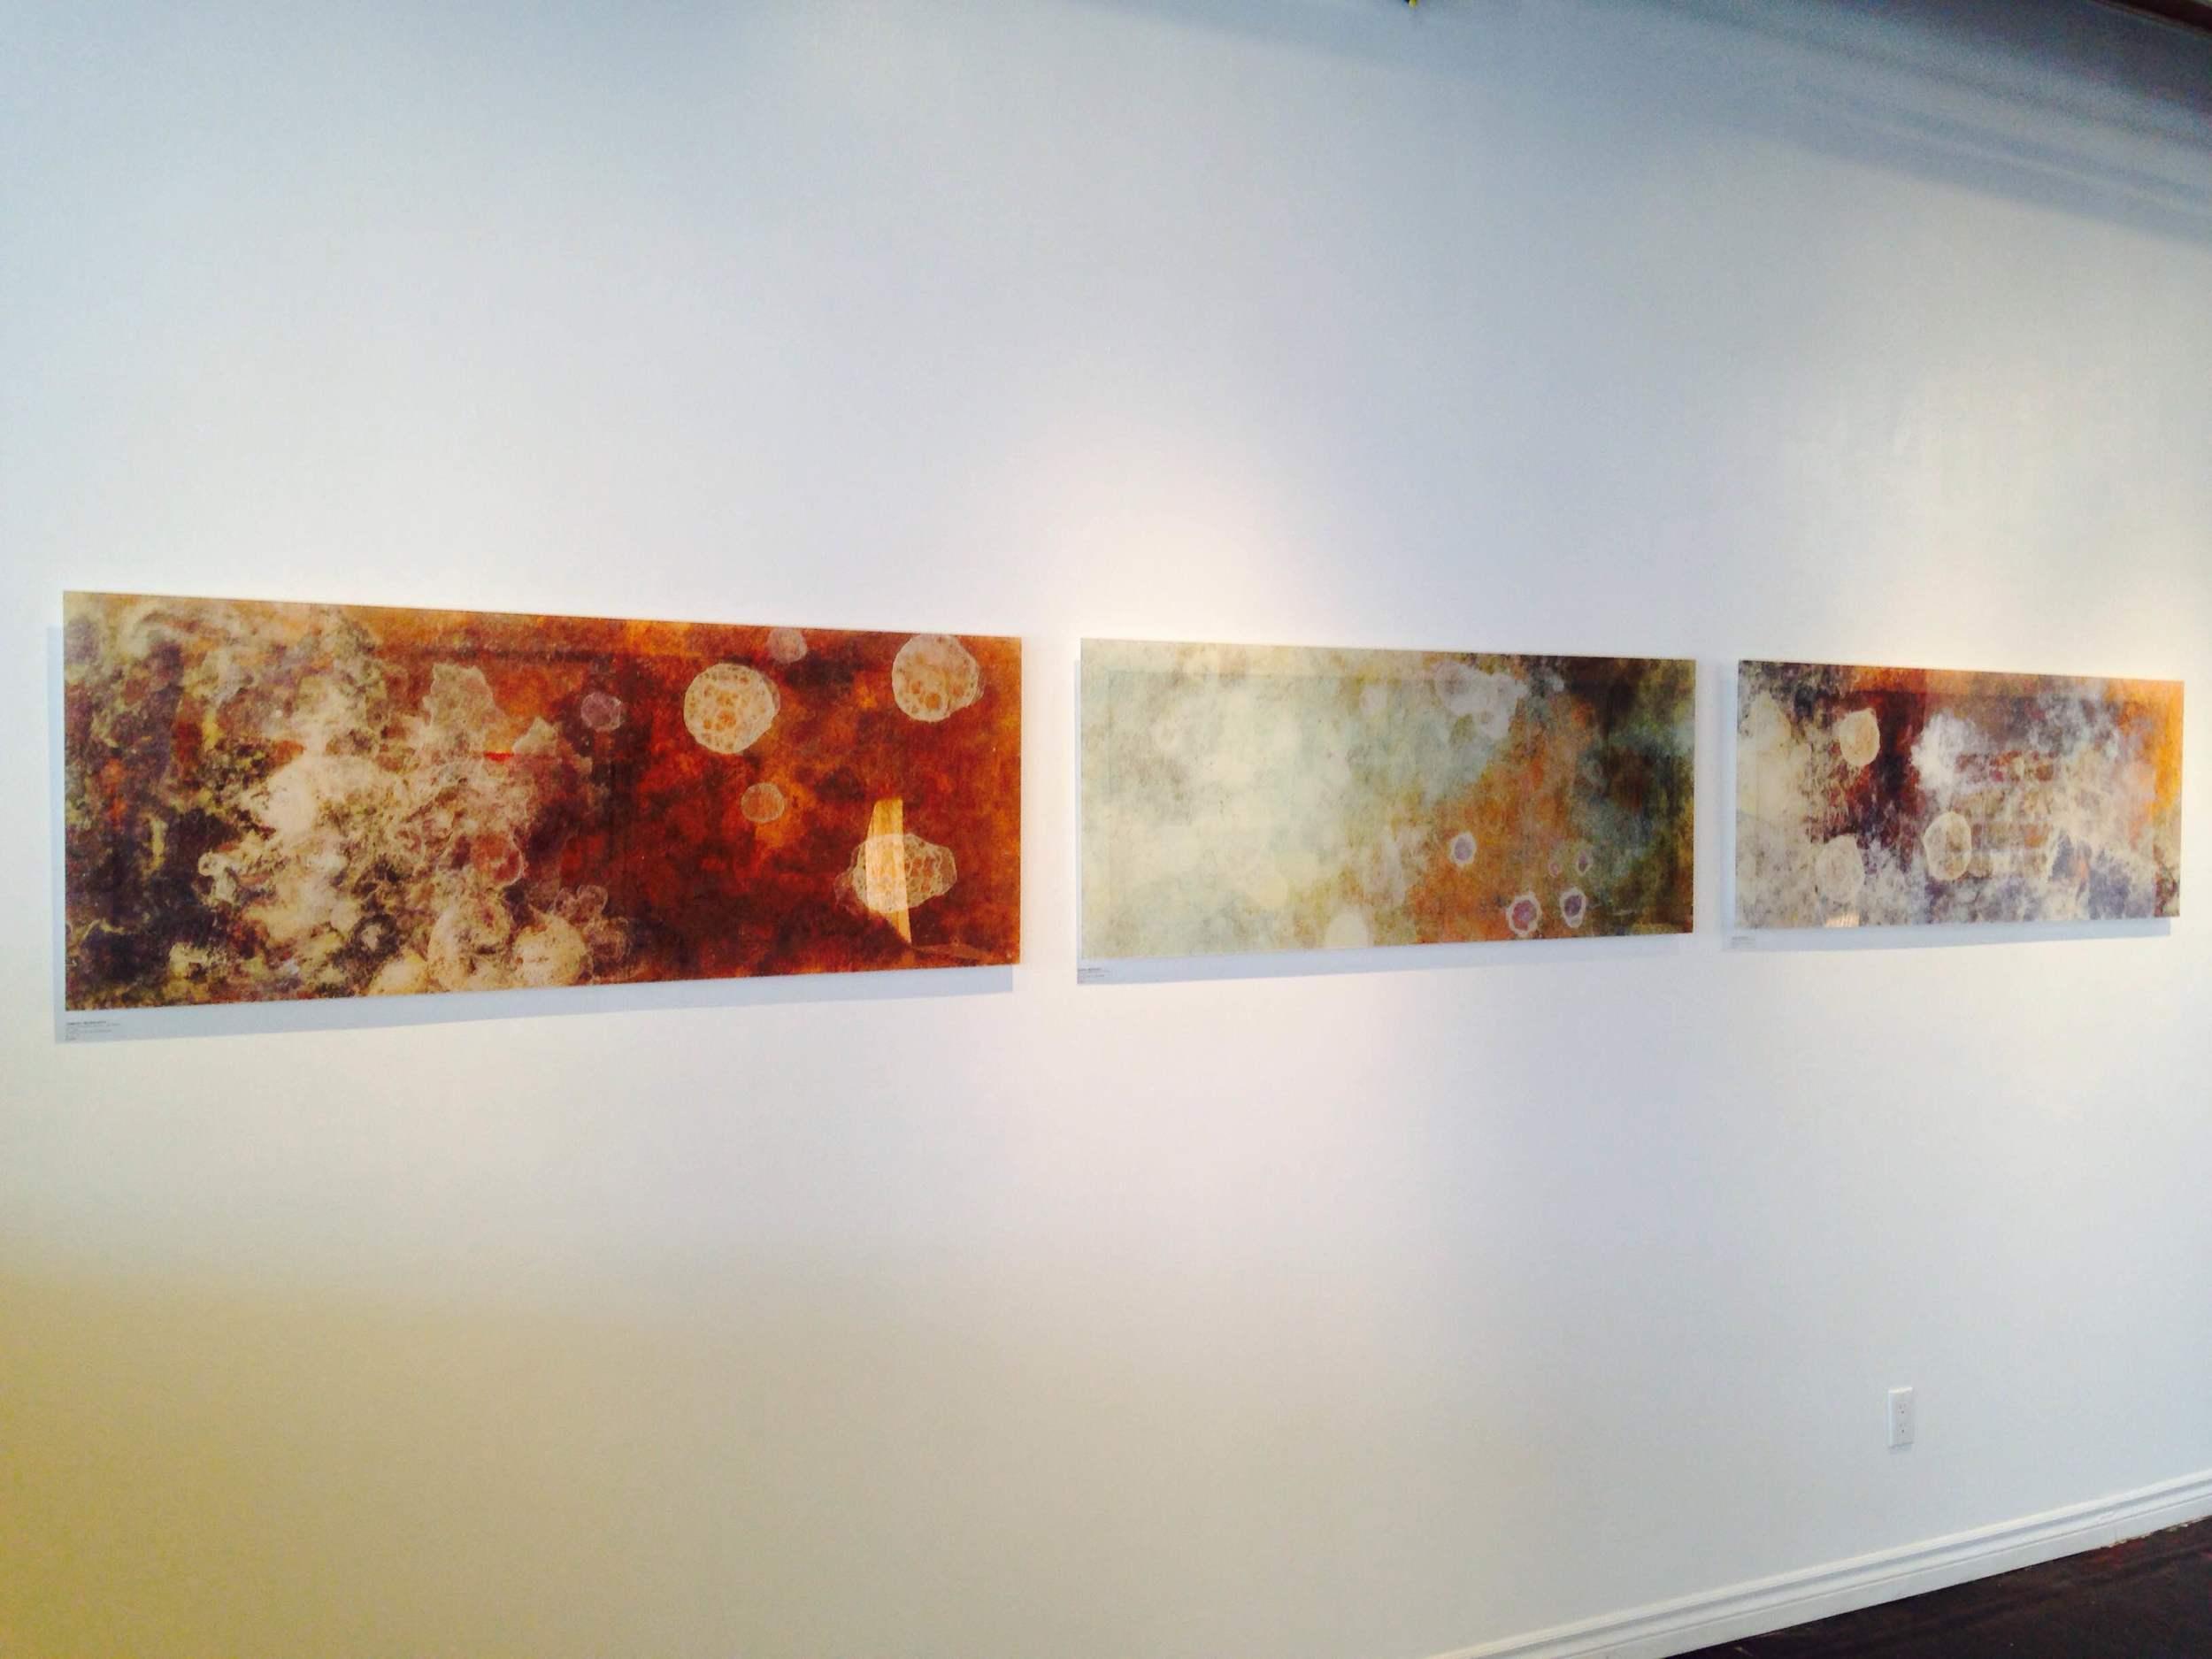 Works by Jasmine Mujkanovic